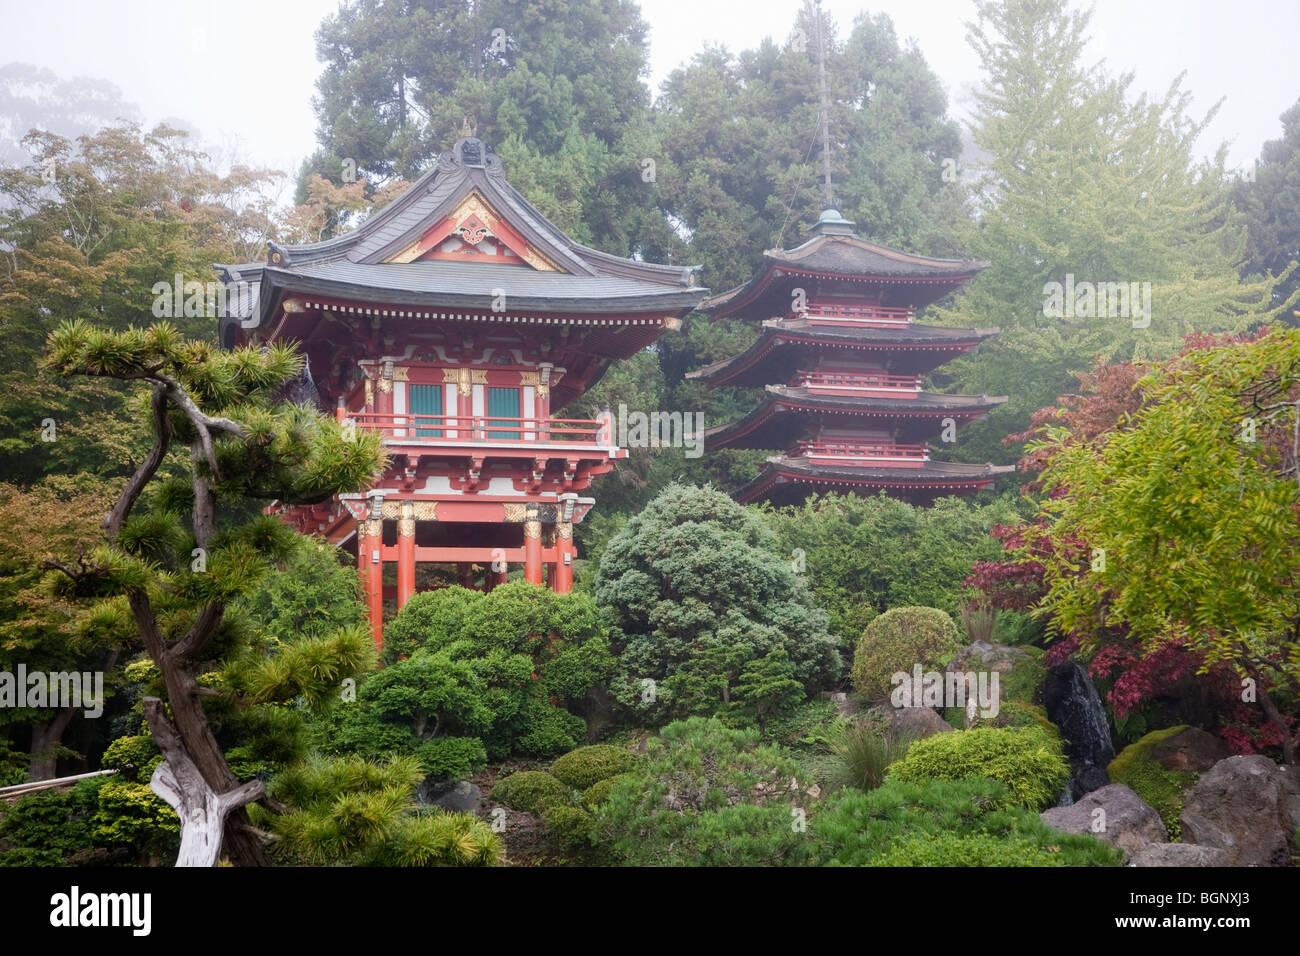 Temple Gate And Pagoda Japanese Tea Garden Golden Gate Park